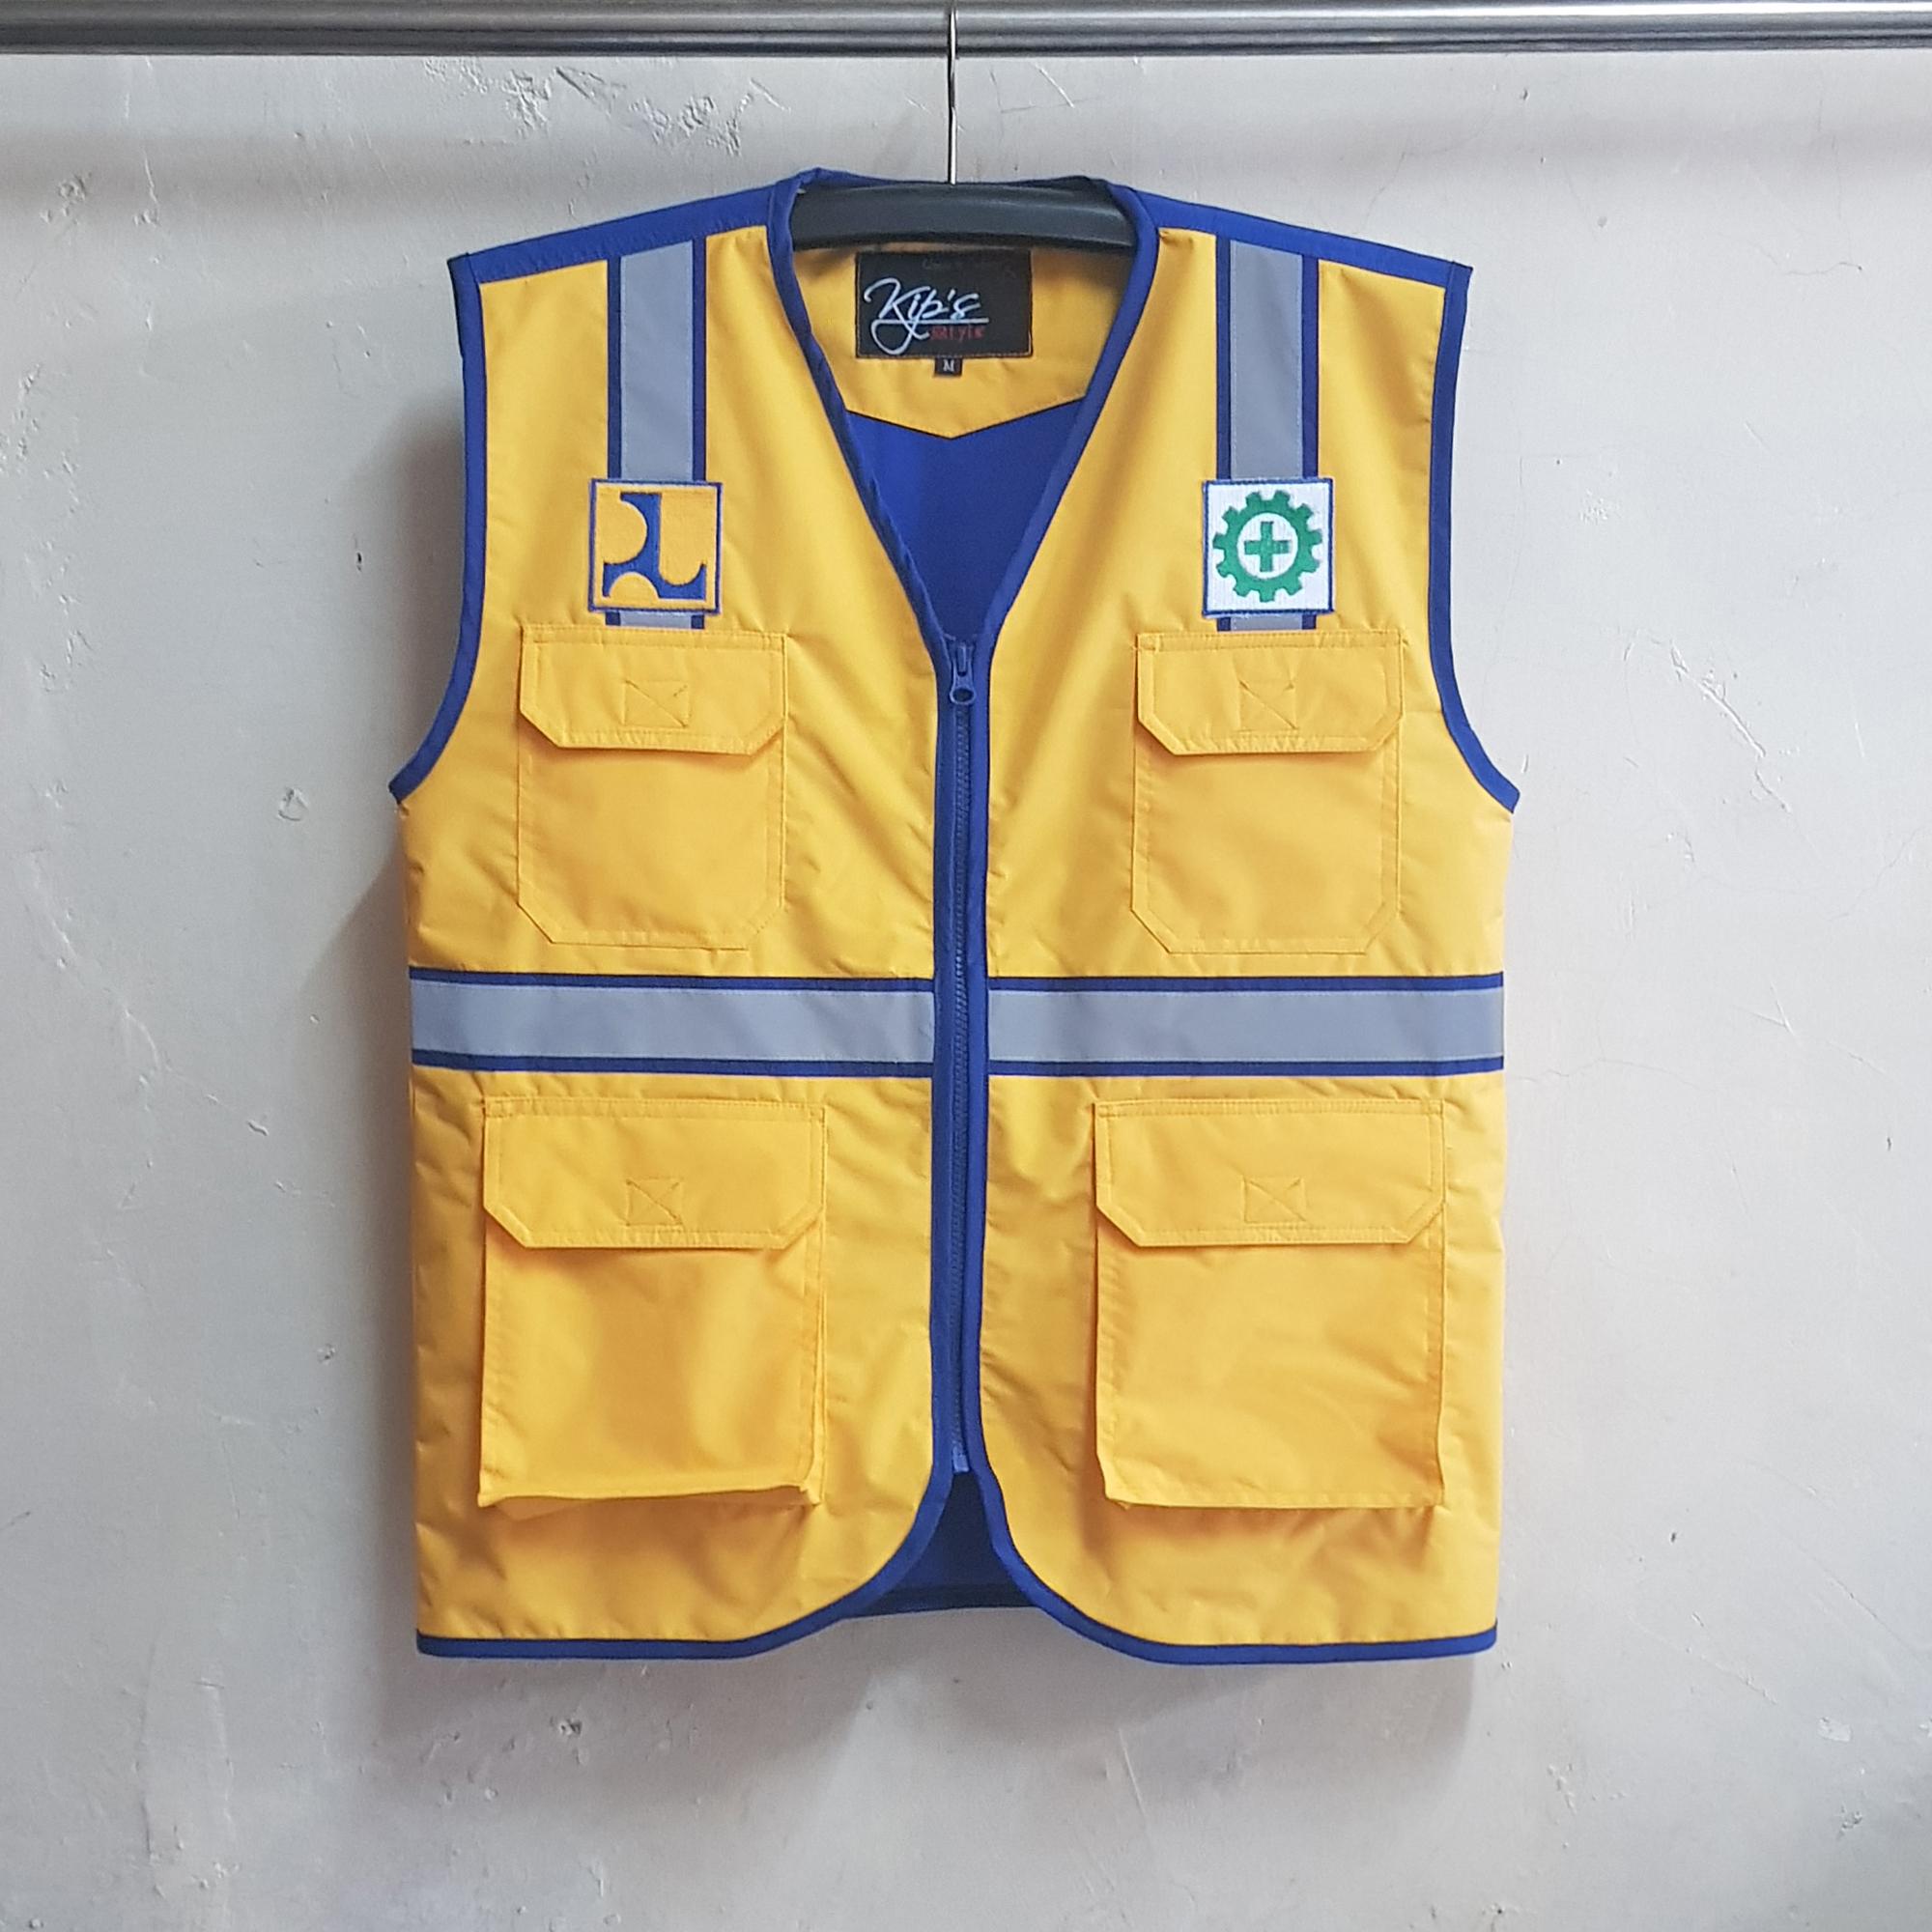 Rompi PU Ditjen Bina Marga, Rompi Safety WP